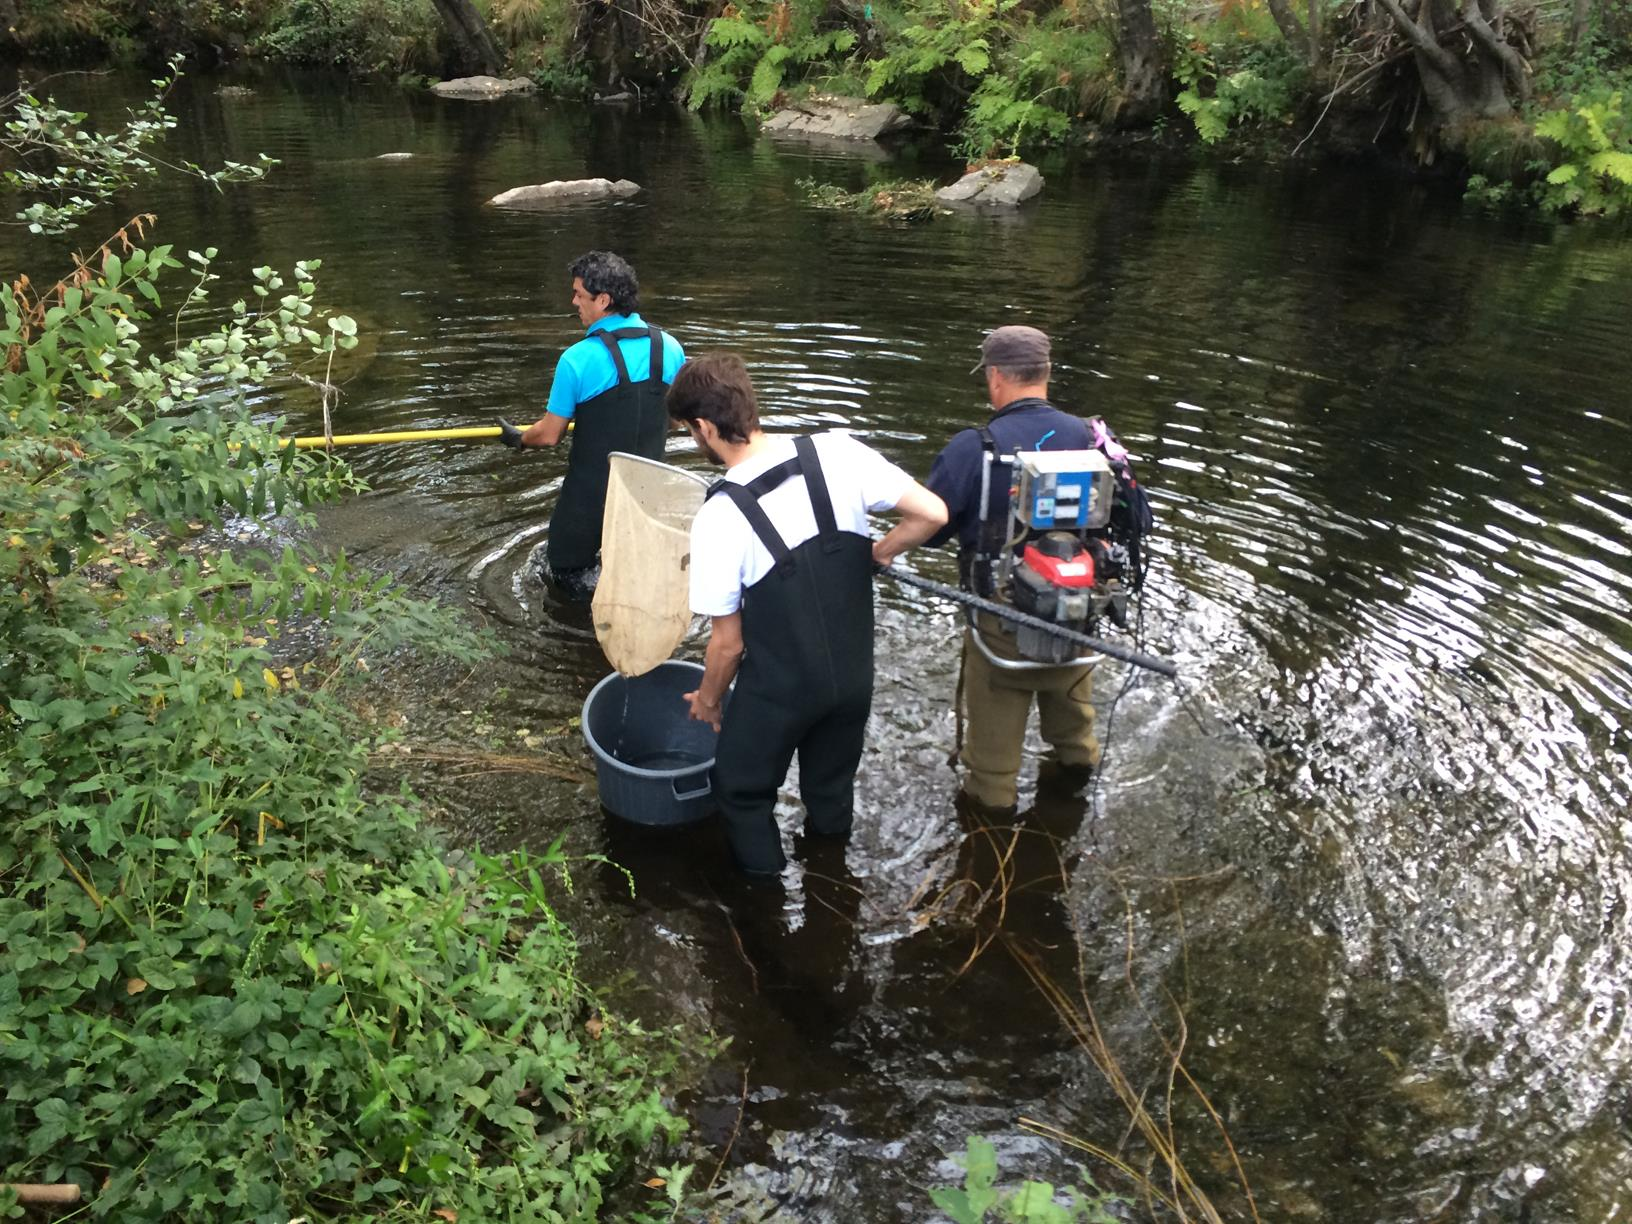 captura de peixes pesca eletrica